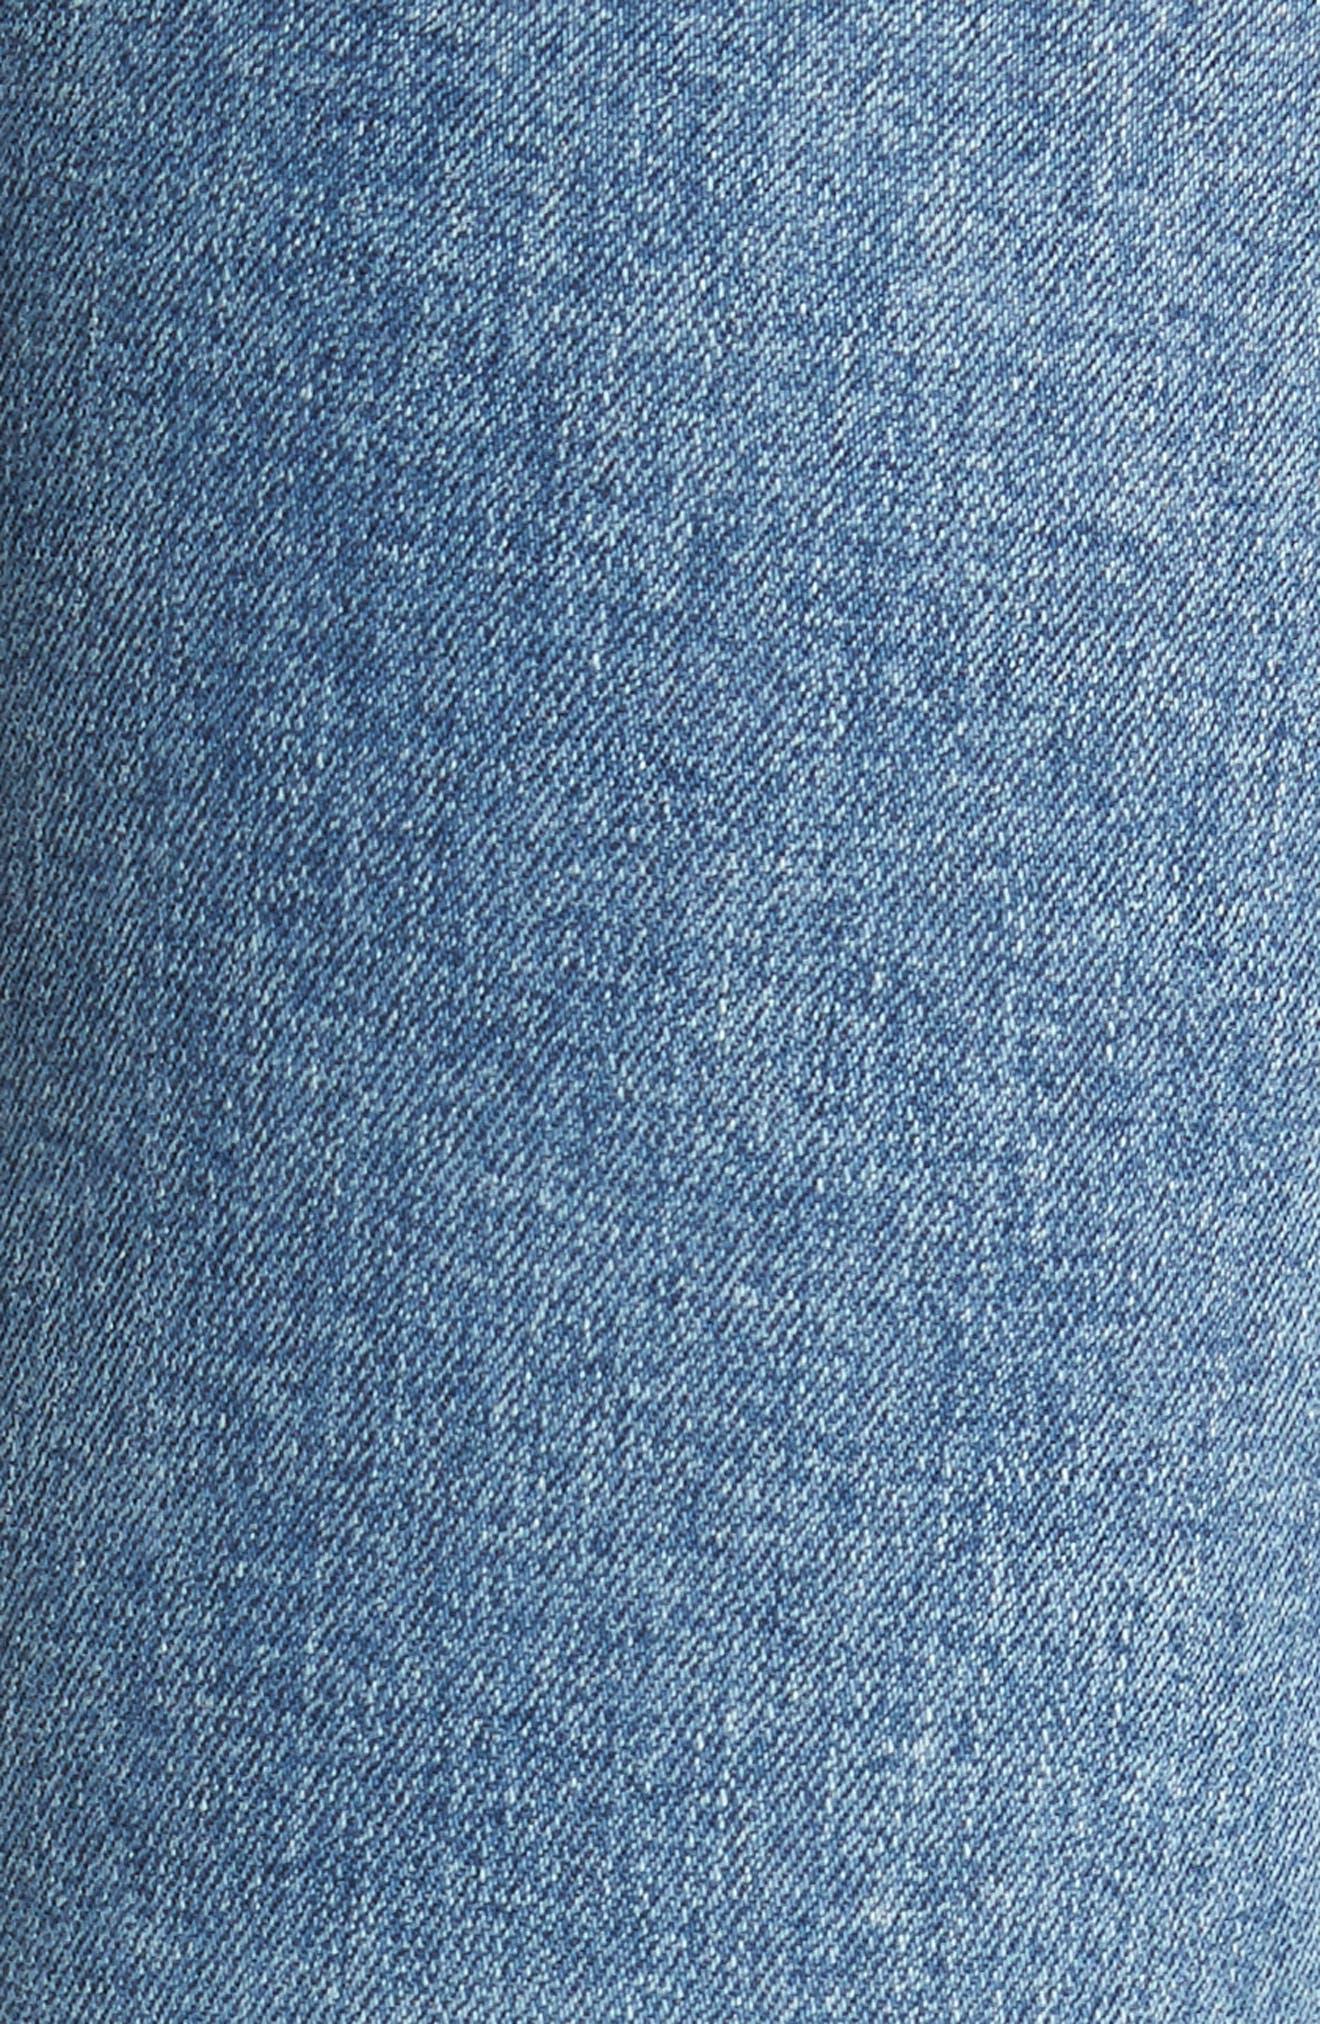 Rocket High Waist Crop Skinny Jeans,                             Alternate thumbnail 6, color,                             Firestone